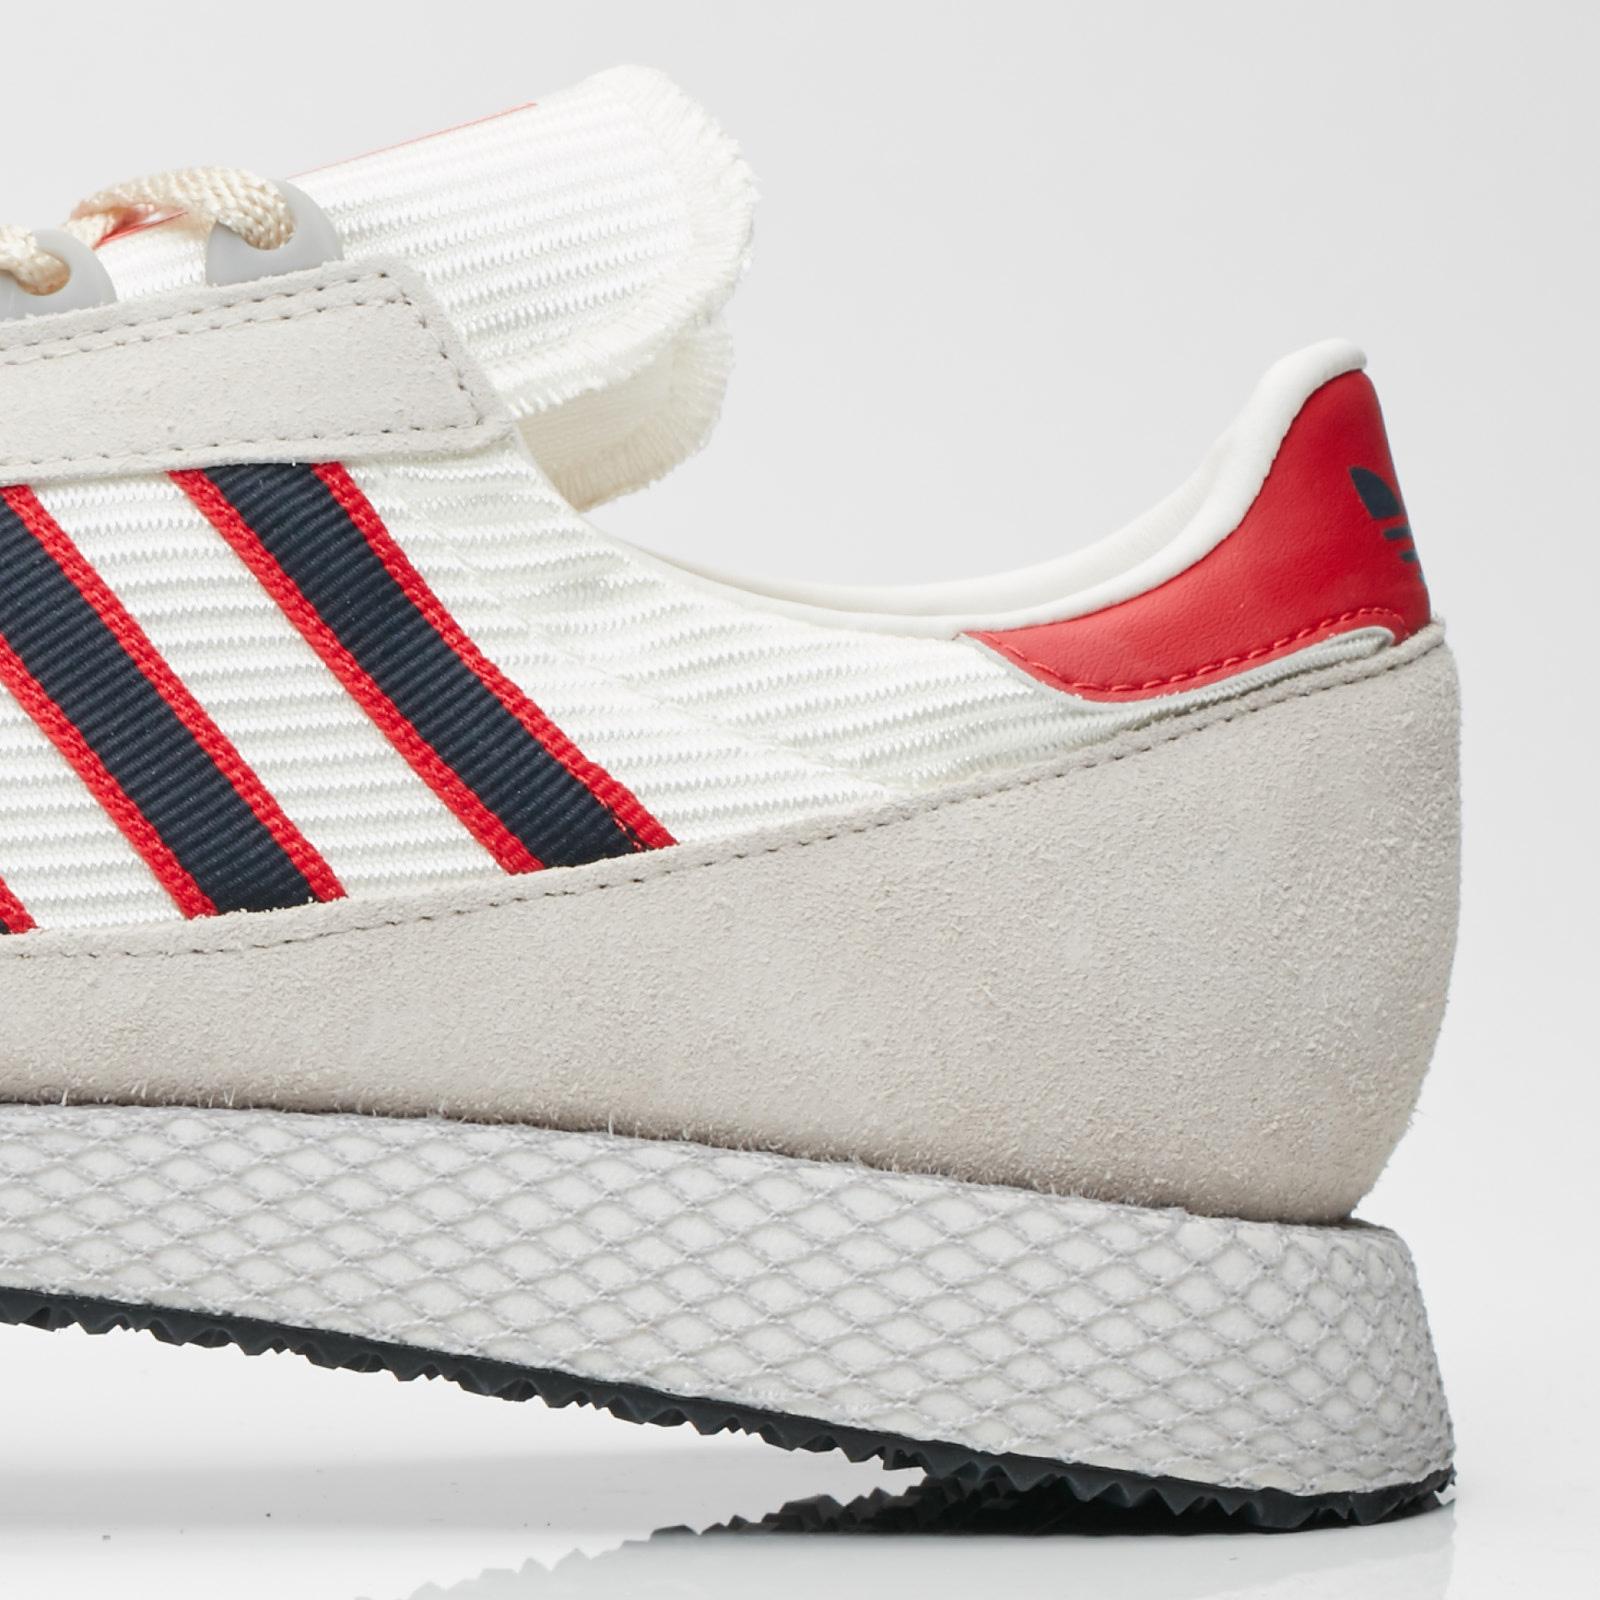 adidas Originals Glenbuck SPZL Spezial